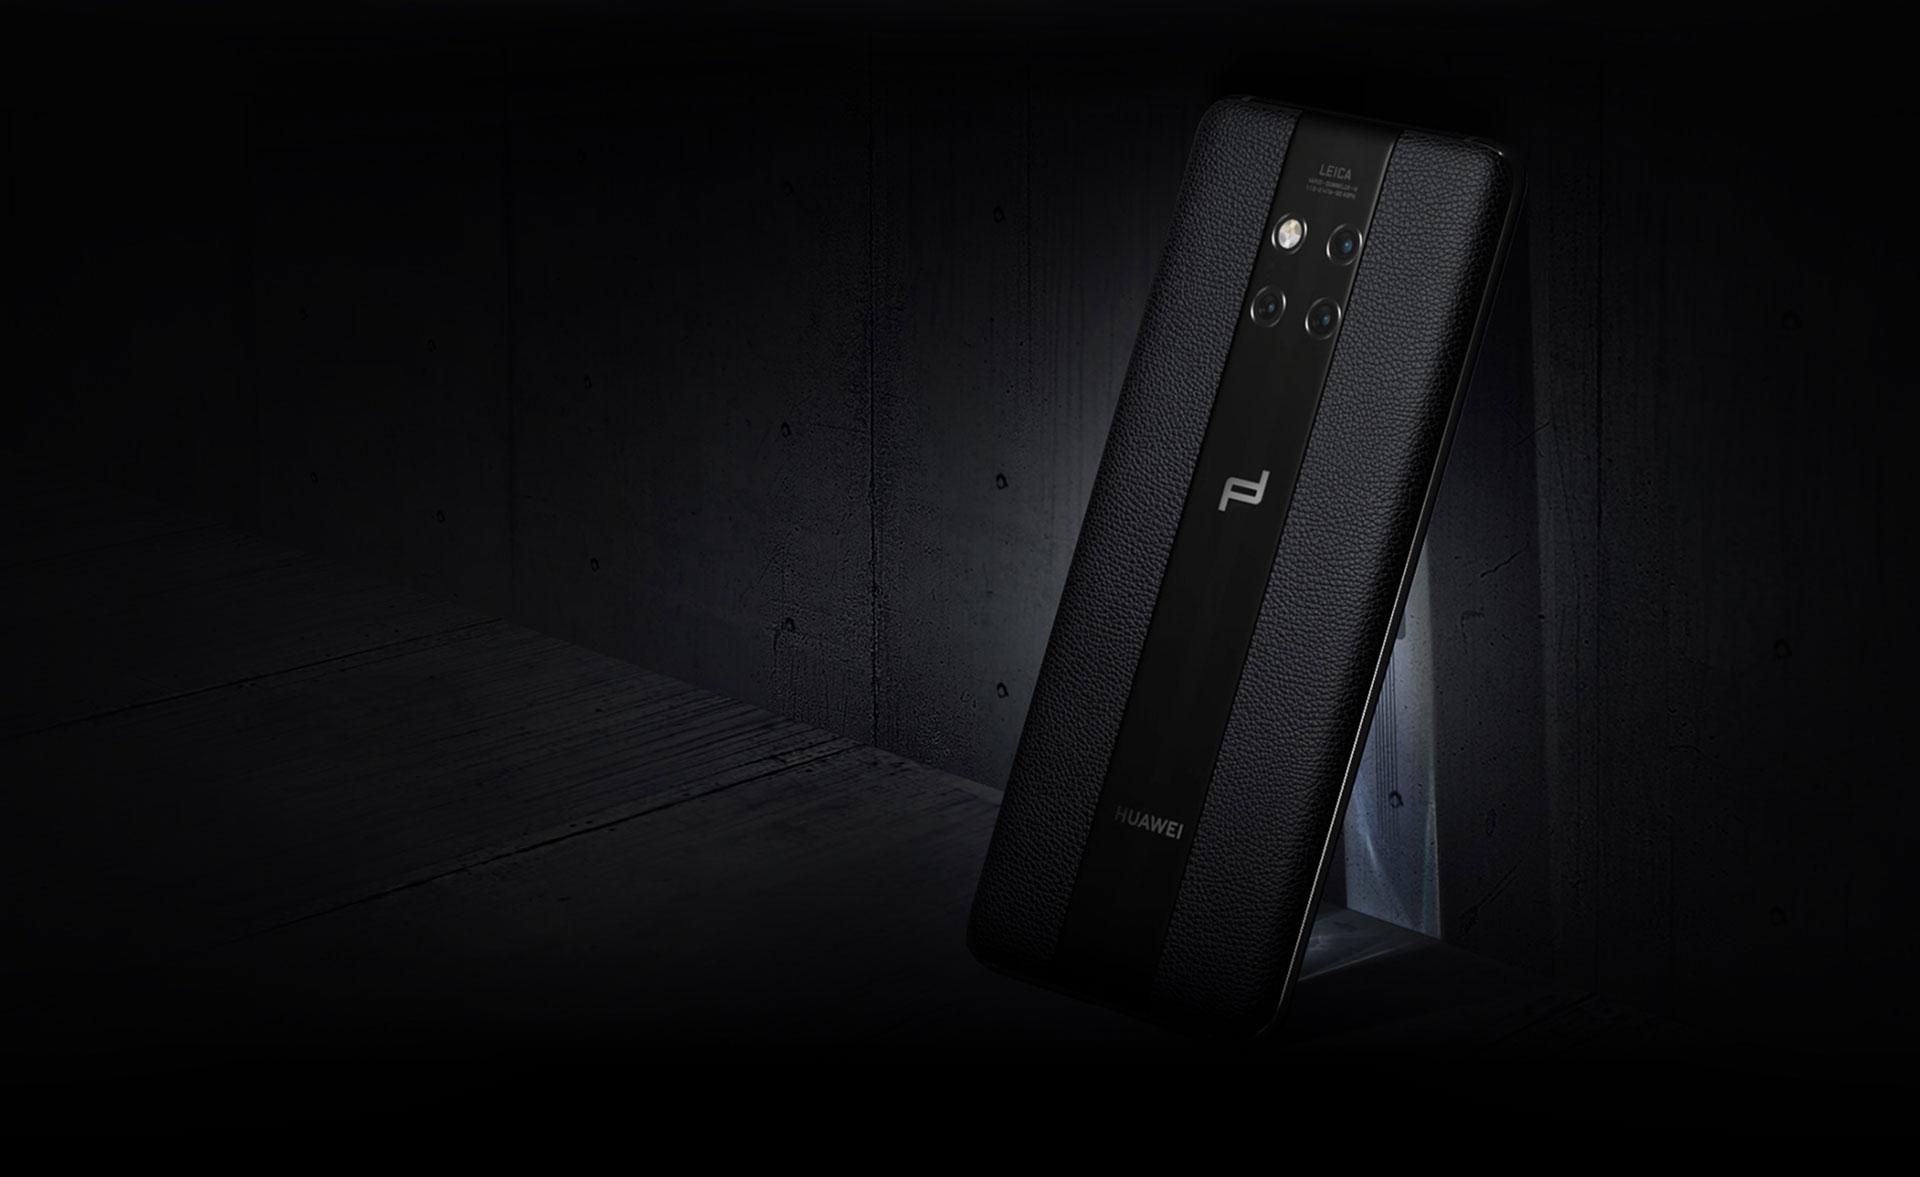 Huawei-mate20-rs-video.jpg